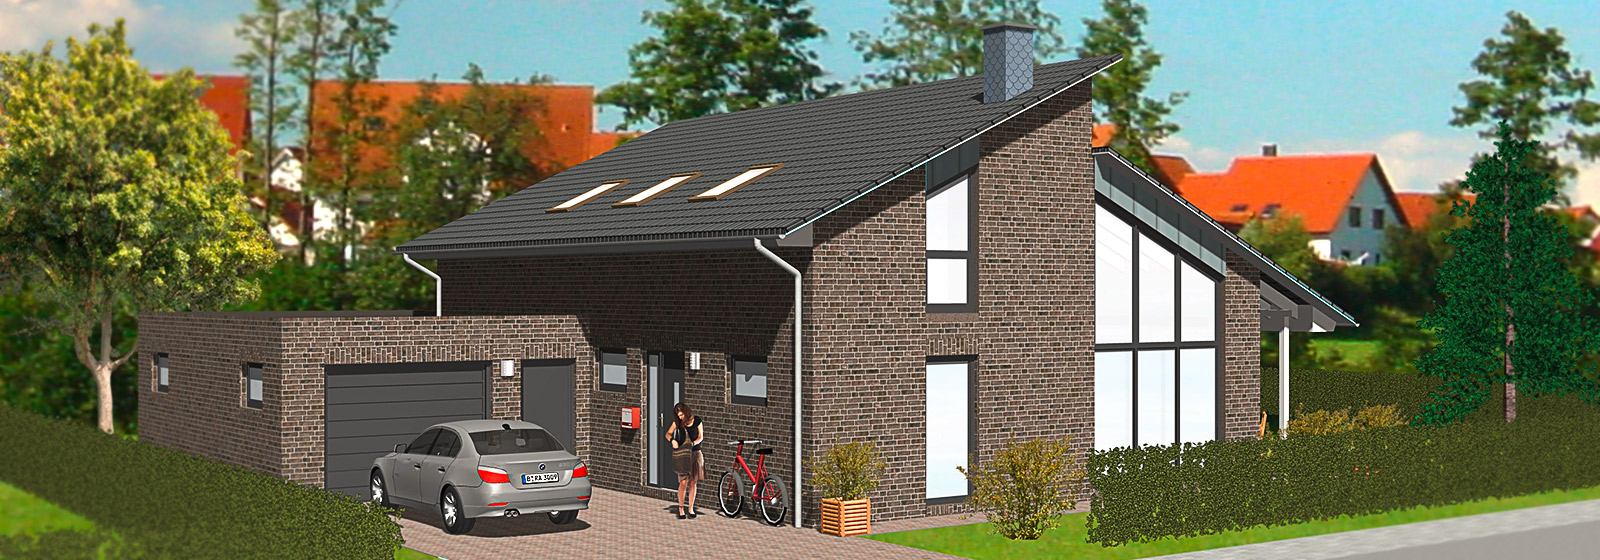 pultdachhaus dieplanerei bauplanung mehr. Black Bedroom Furniture Sets. Home Design Ideas